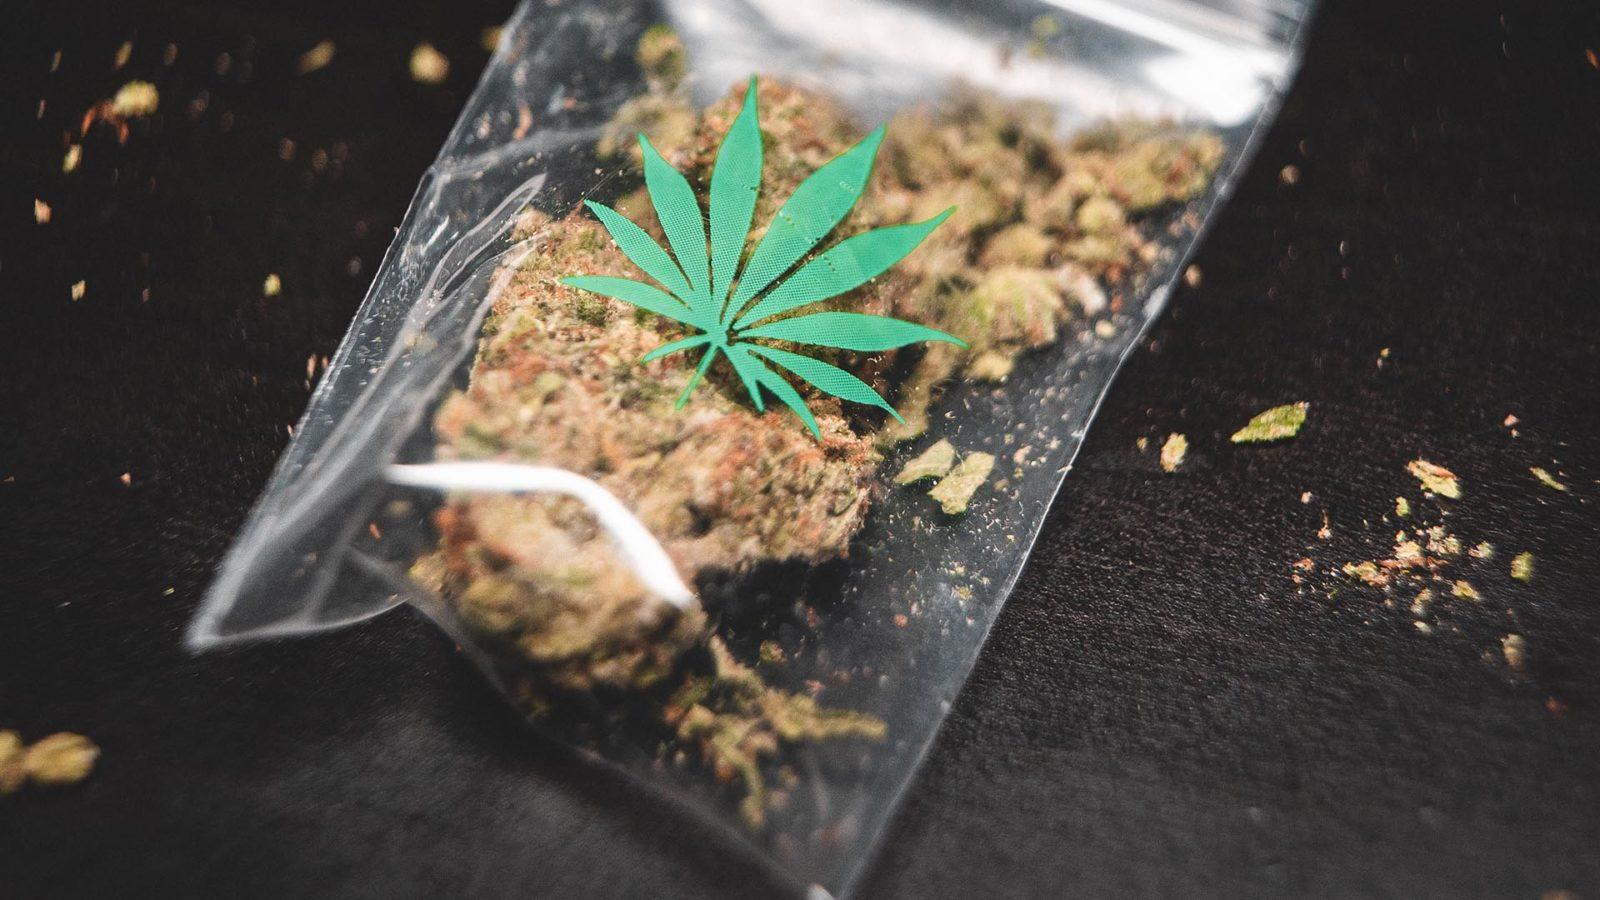 small bag of marijuana